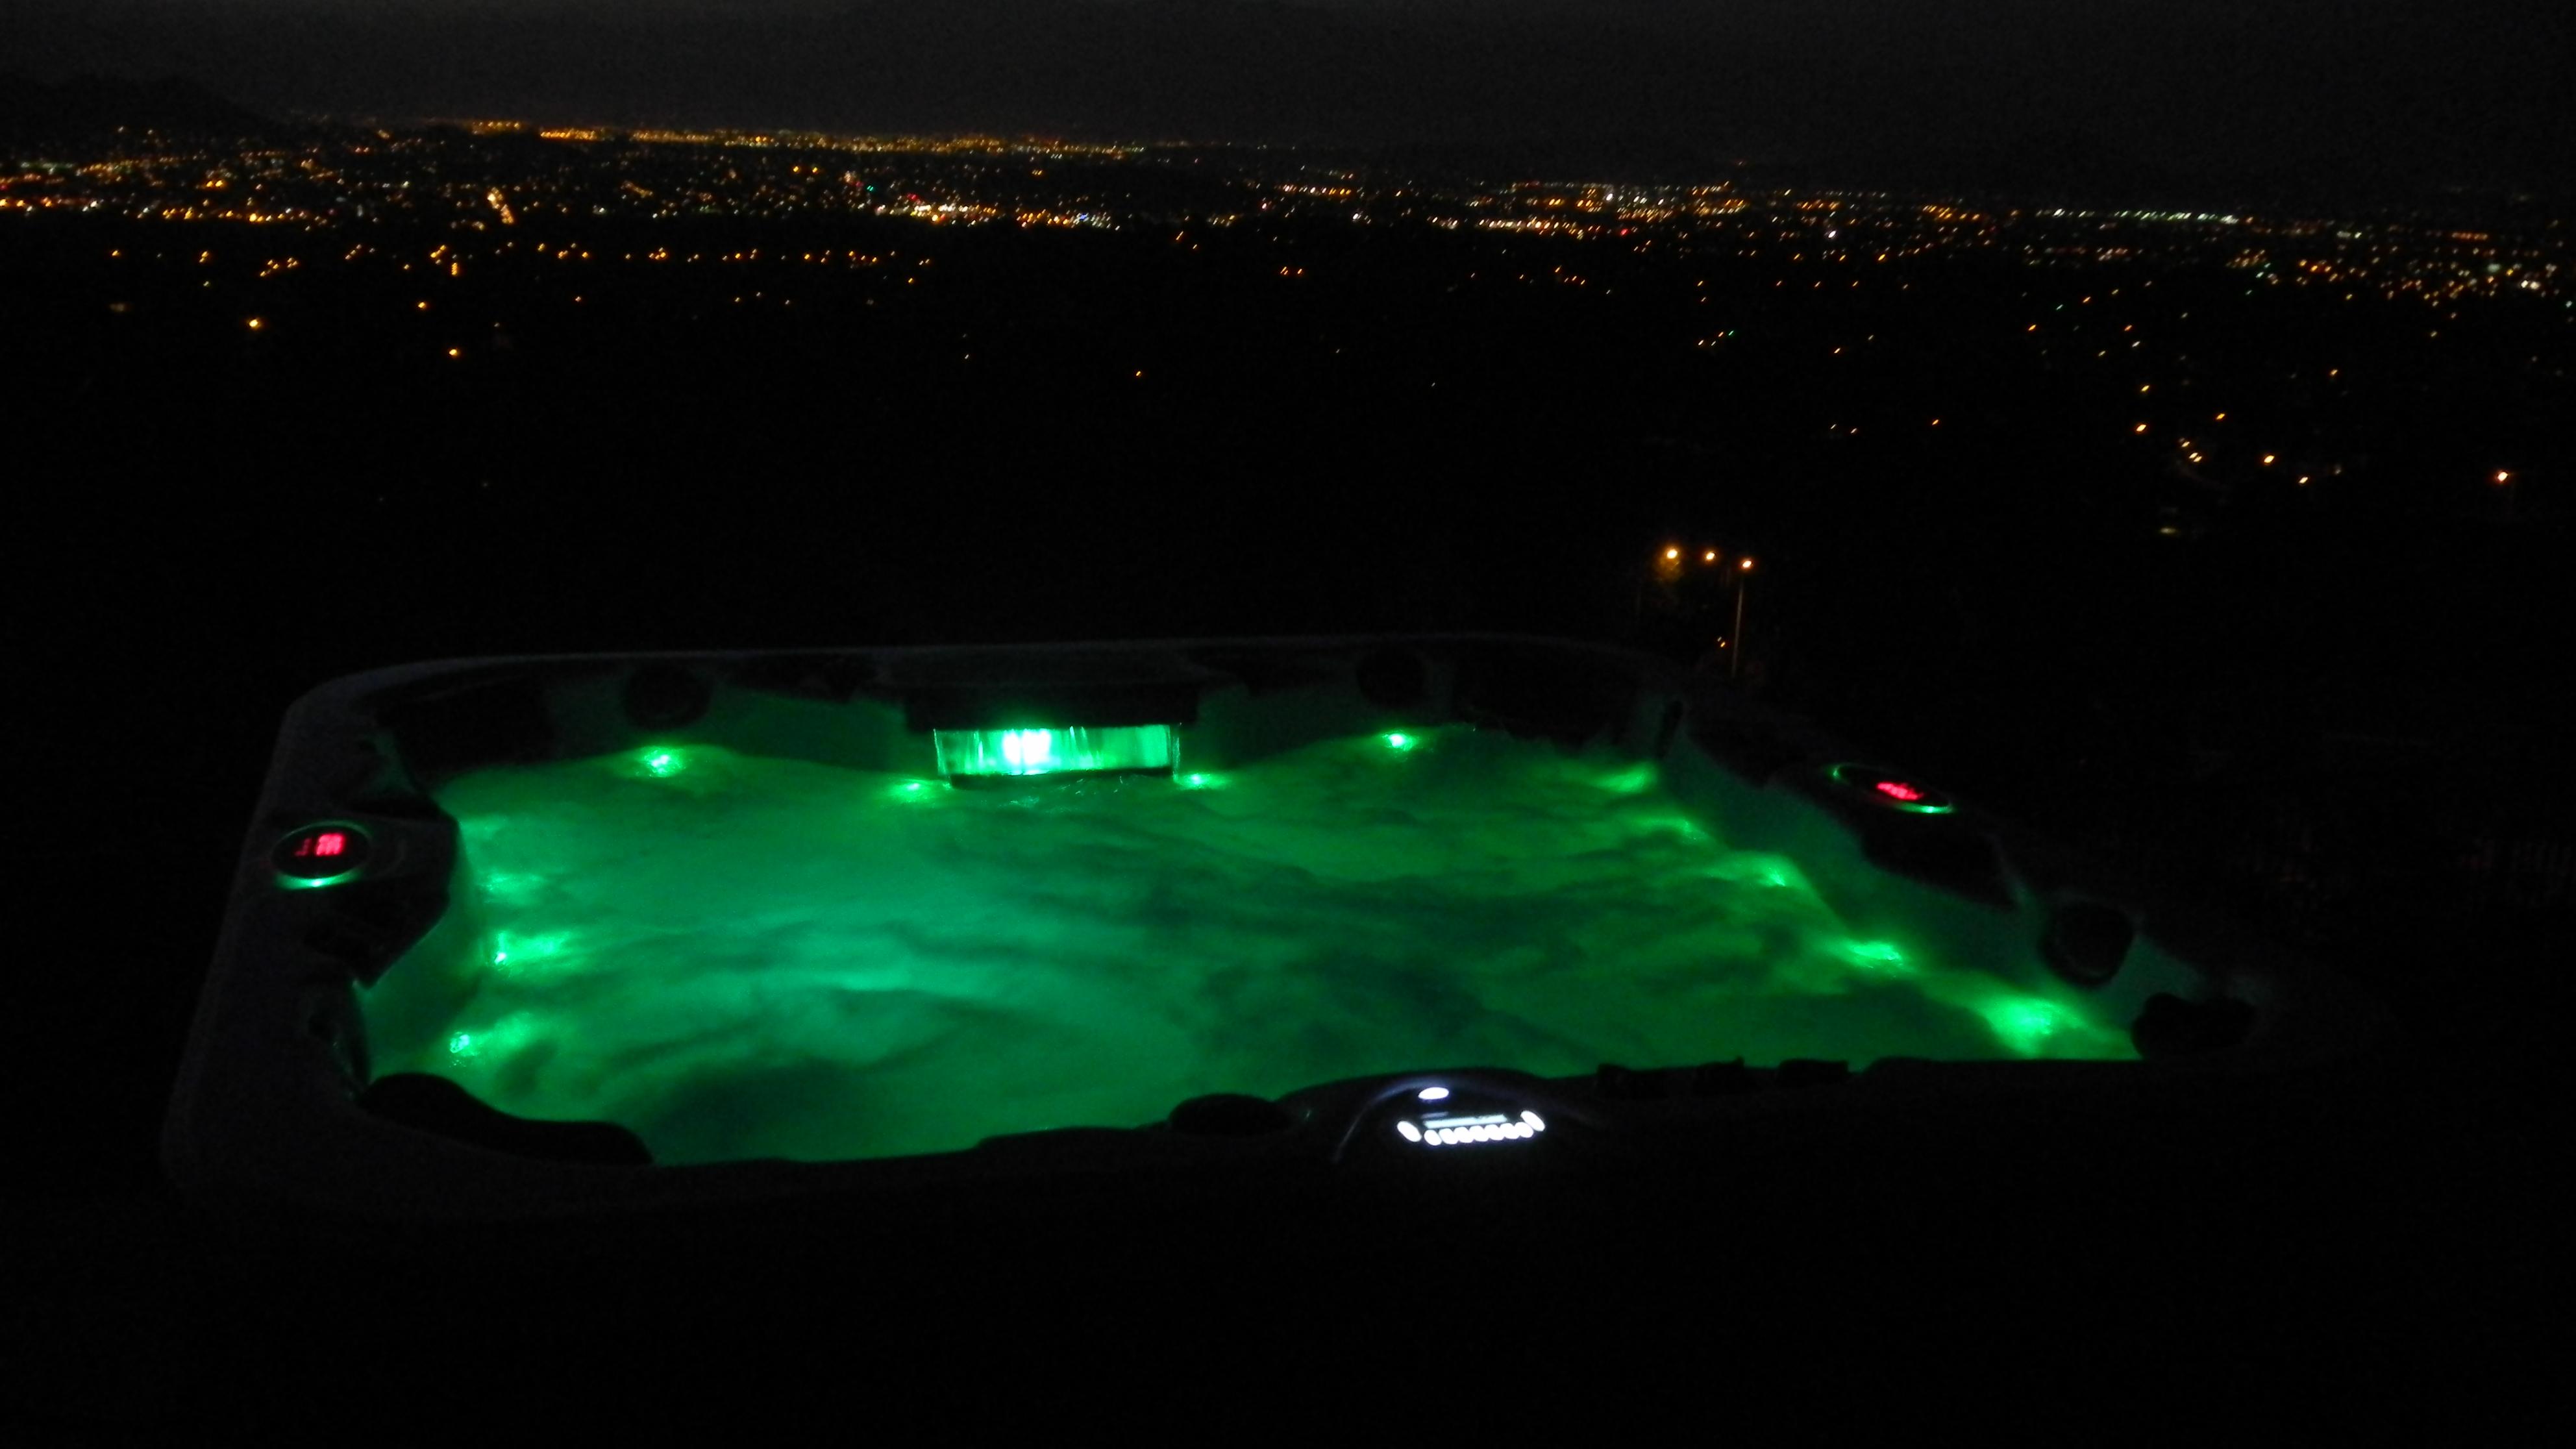 Acura Spa Systems - Spa Lighting